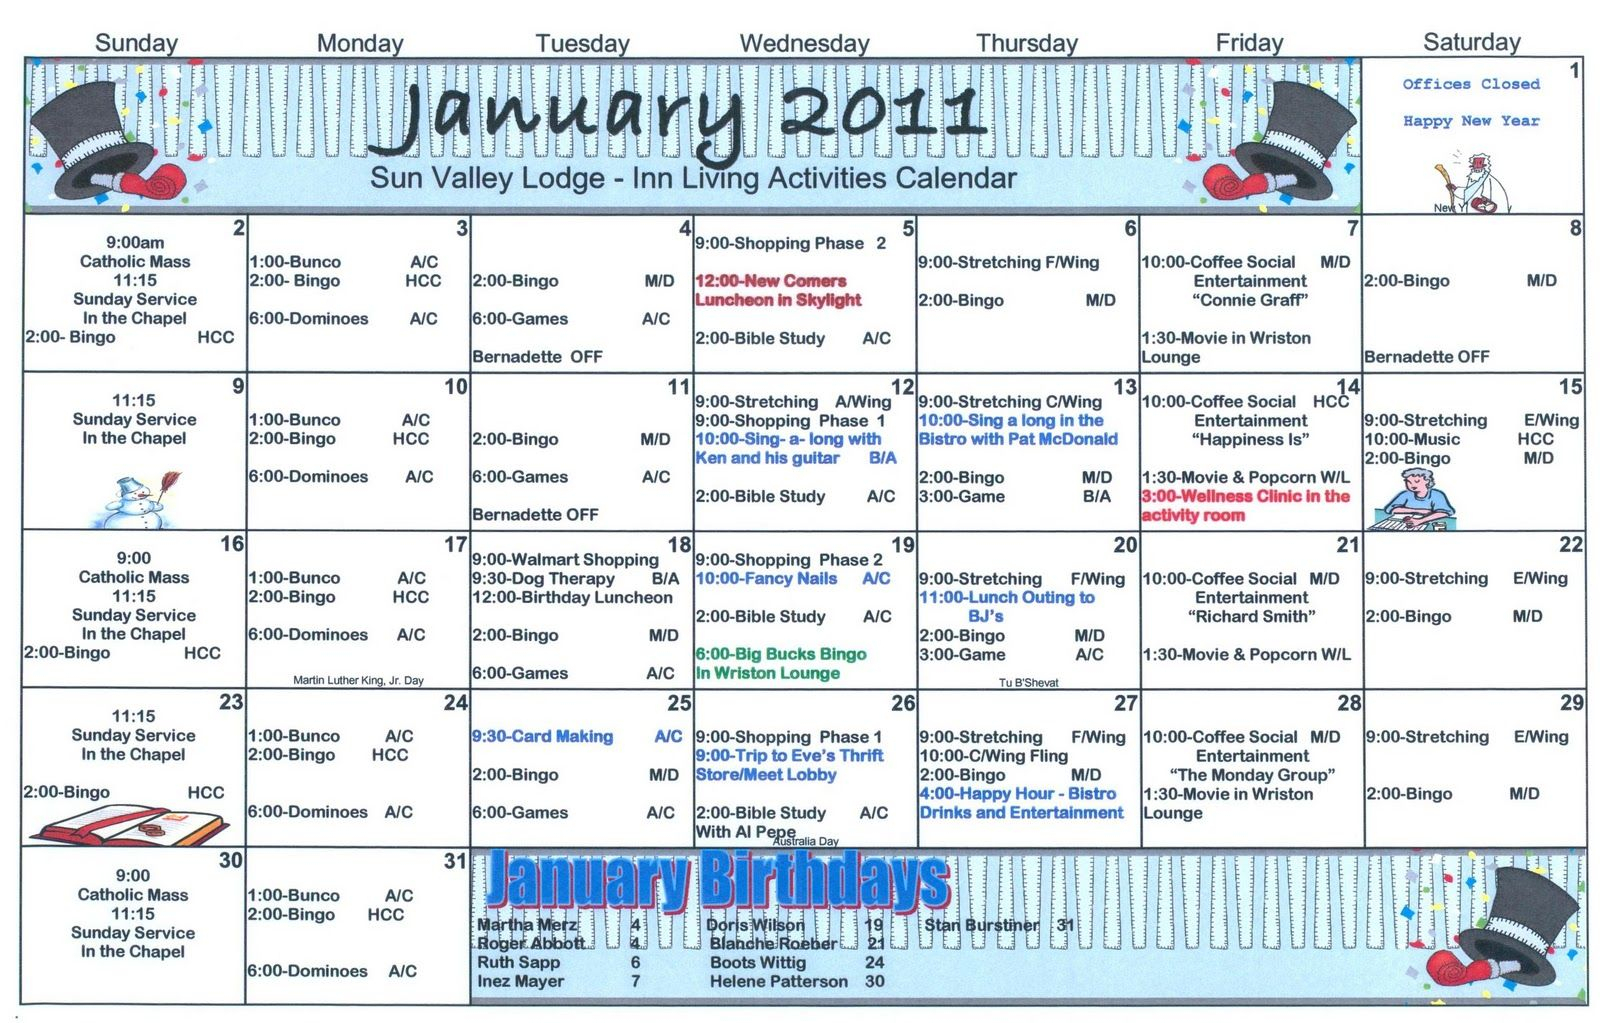 Orlando Convention Center Schedule 2021 | Printable Within Nc Court Calendar Defendant Name